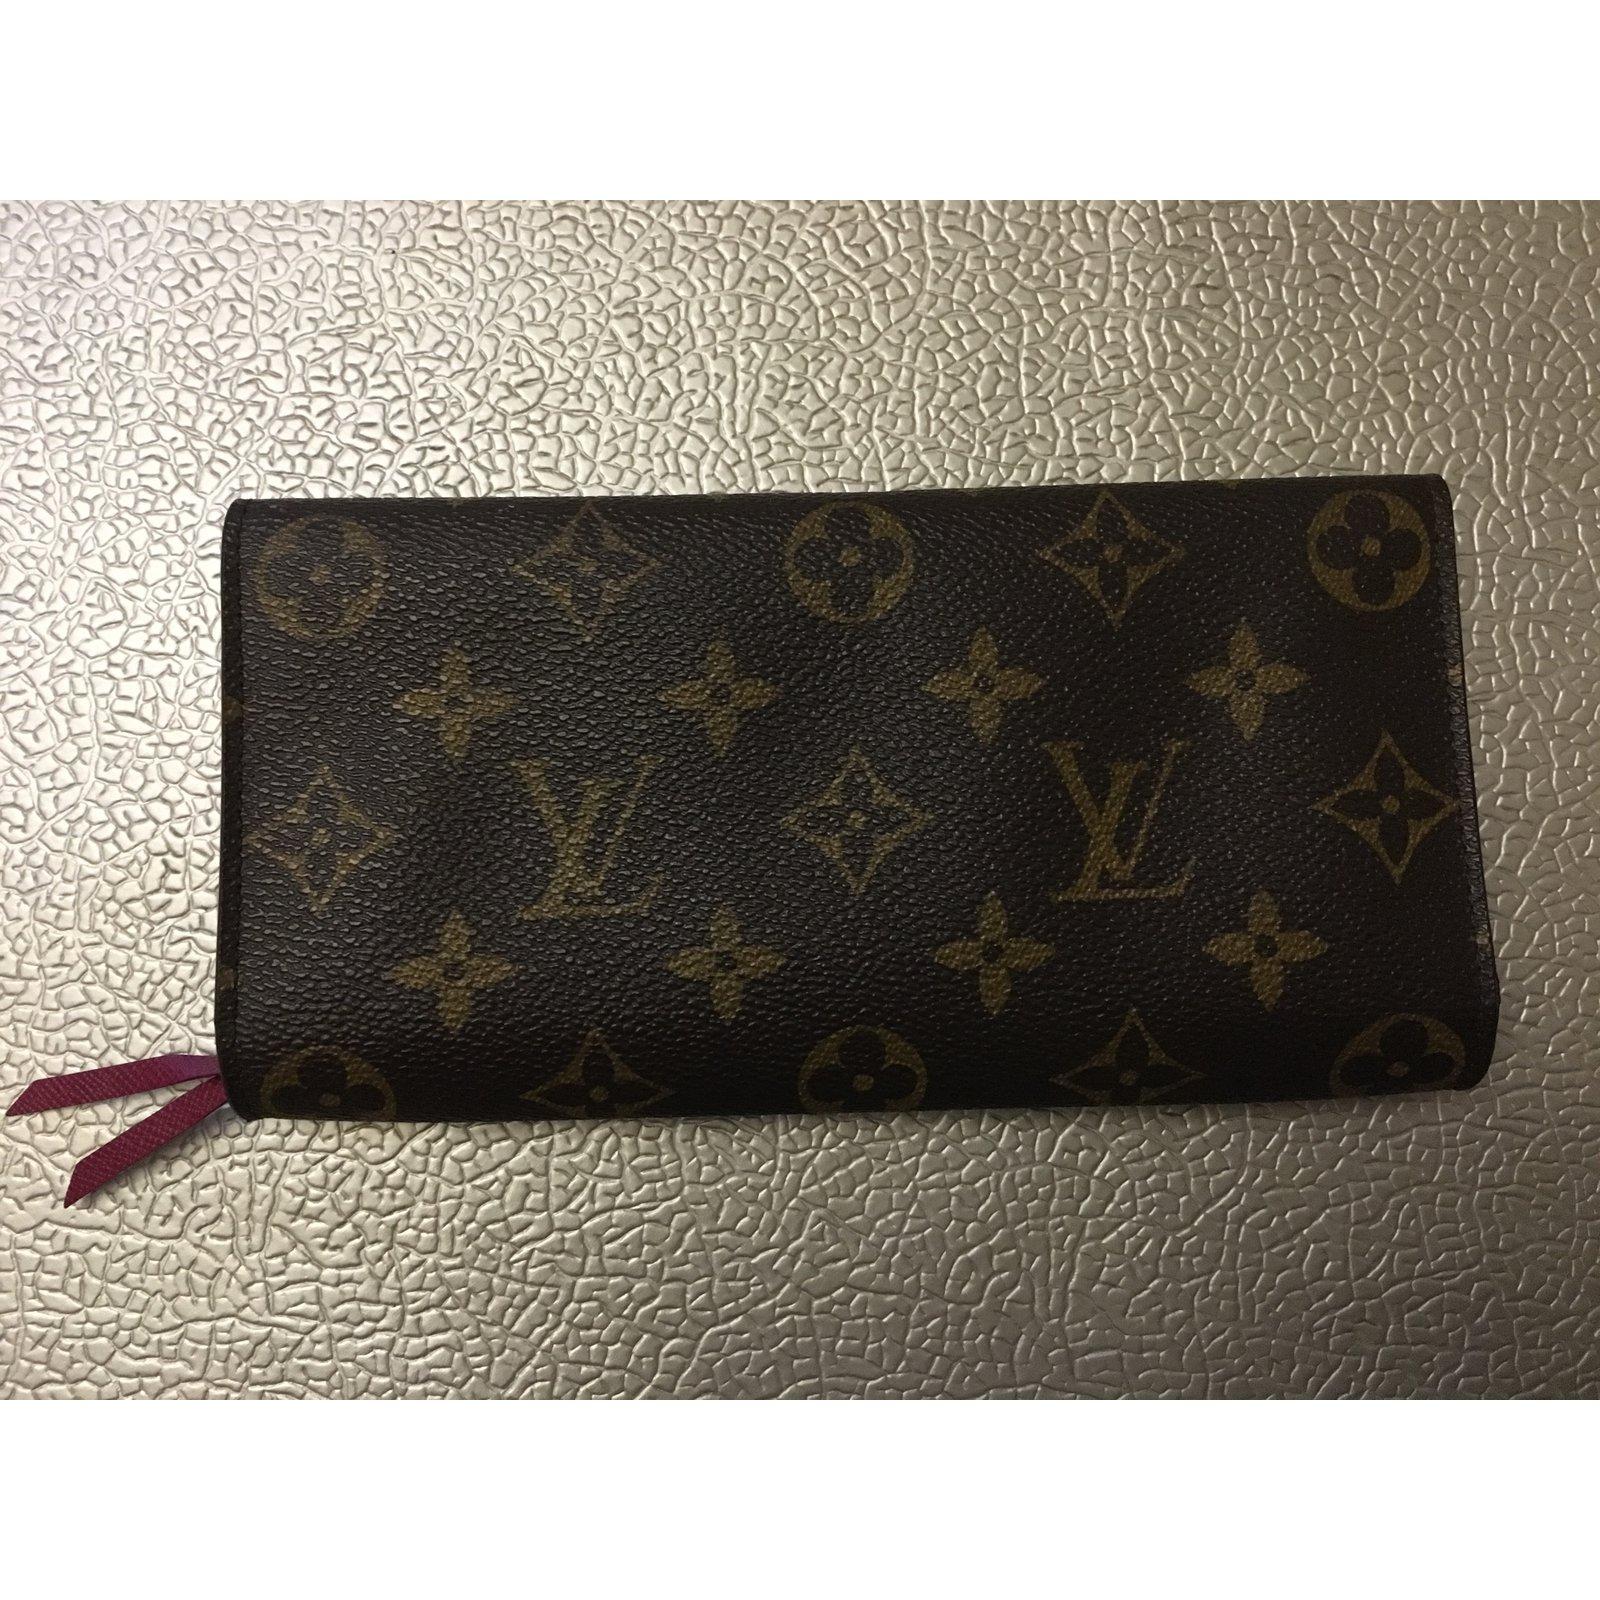 2f60a81f0a8 Facebook · Pin This. Portefeuilles Louis Vuitton portefeuille Monogramme  Louis Vuitton Emilie Wallet Fuchsia Toile Marron ...